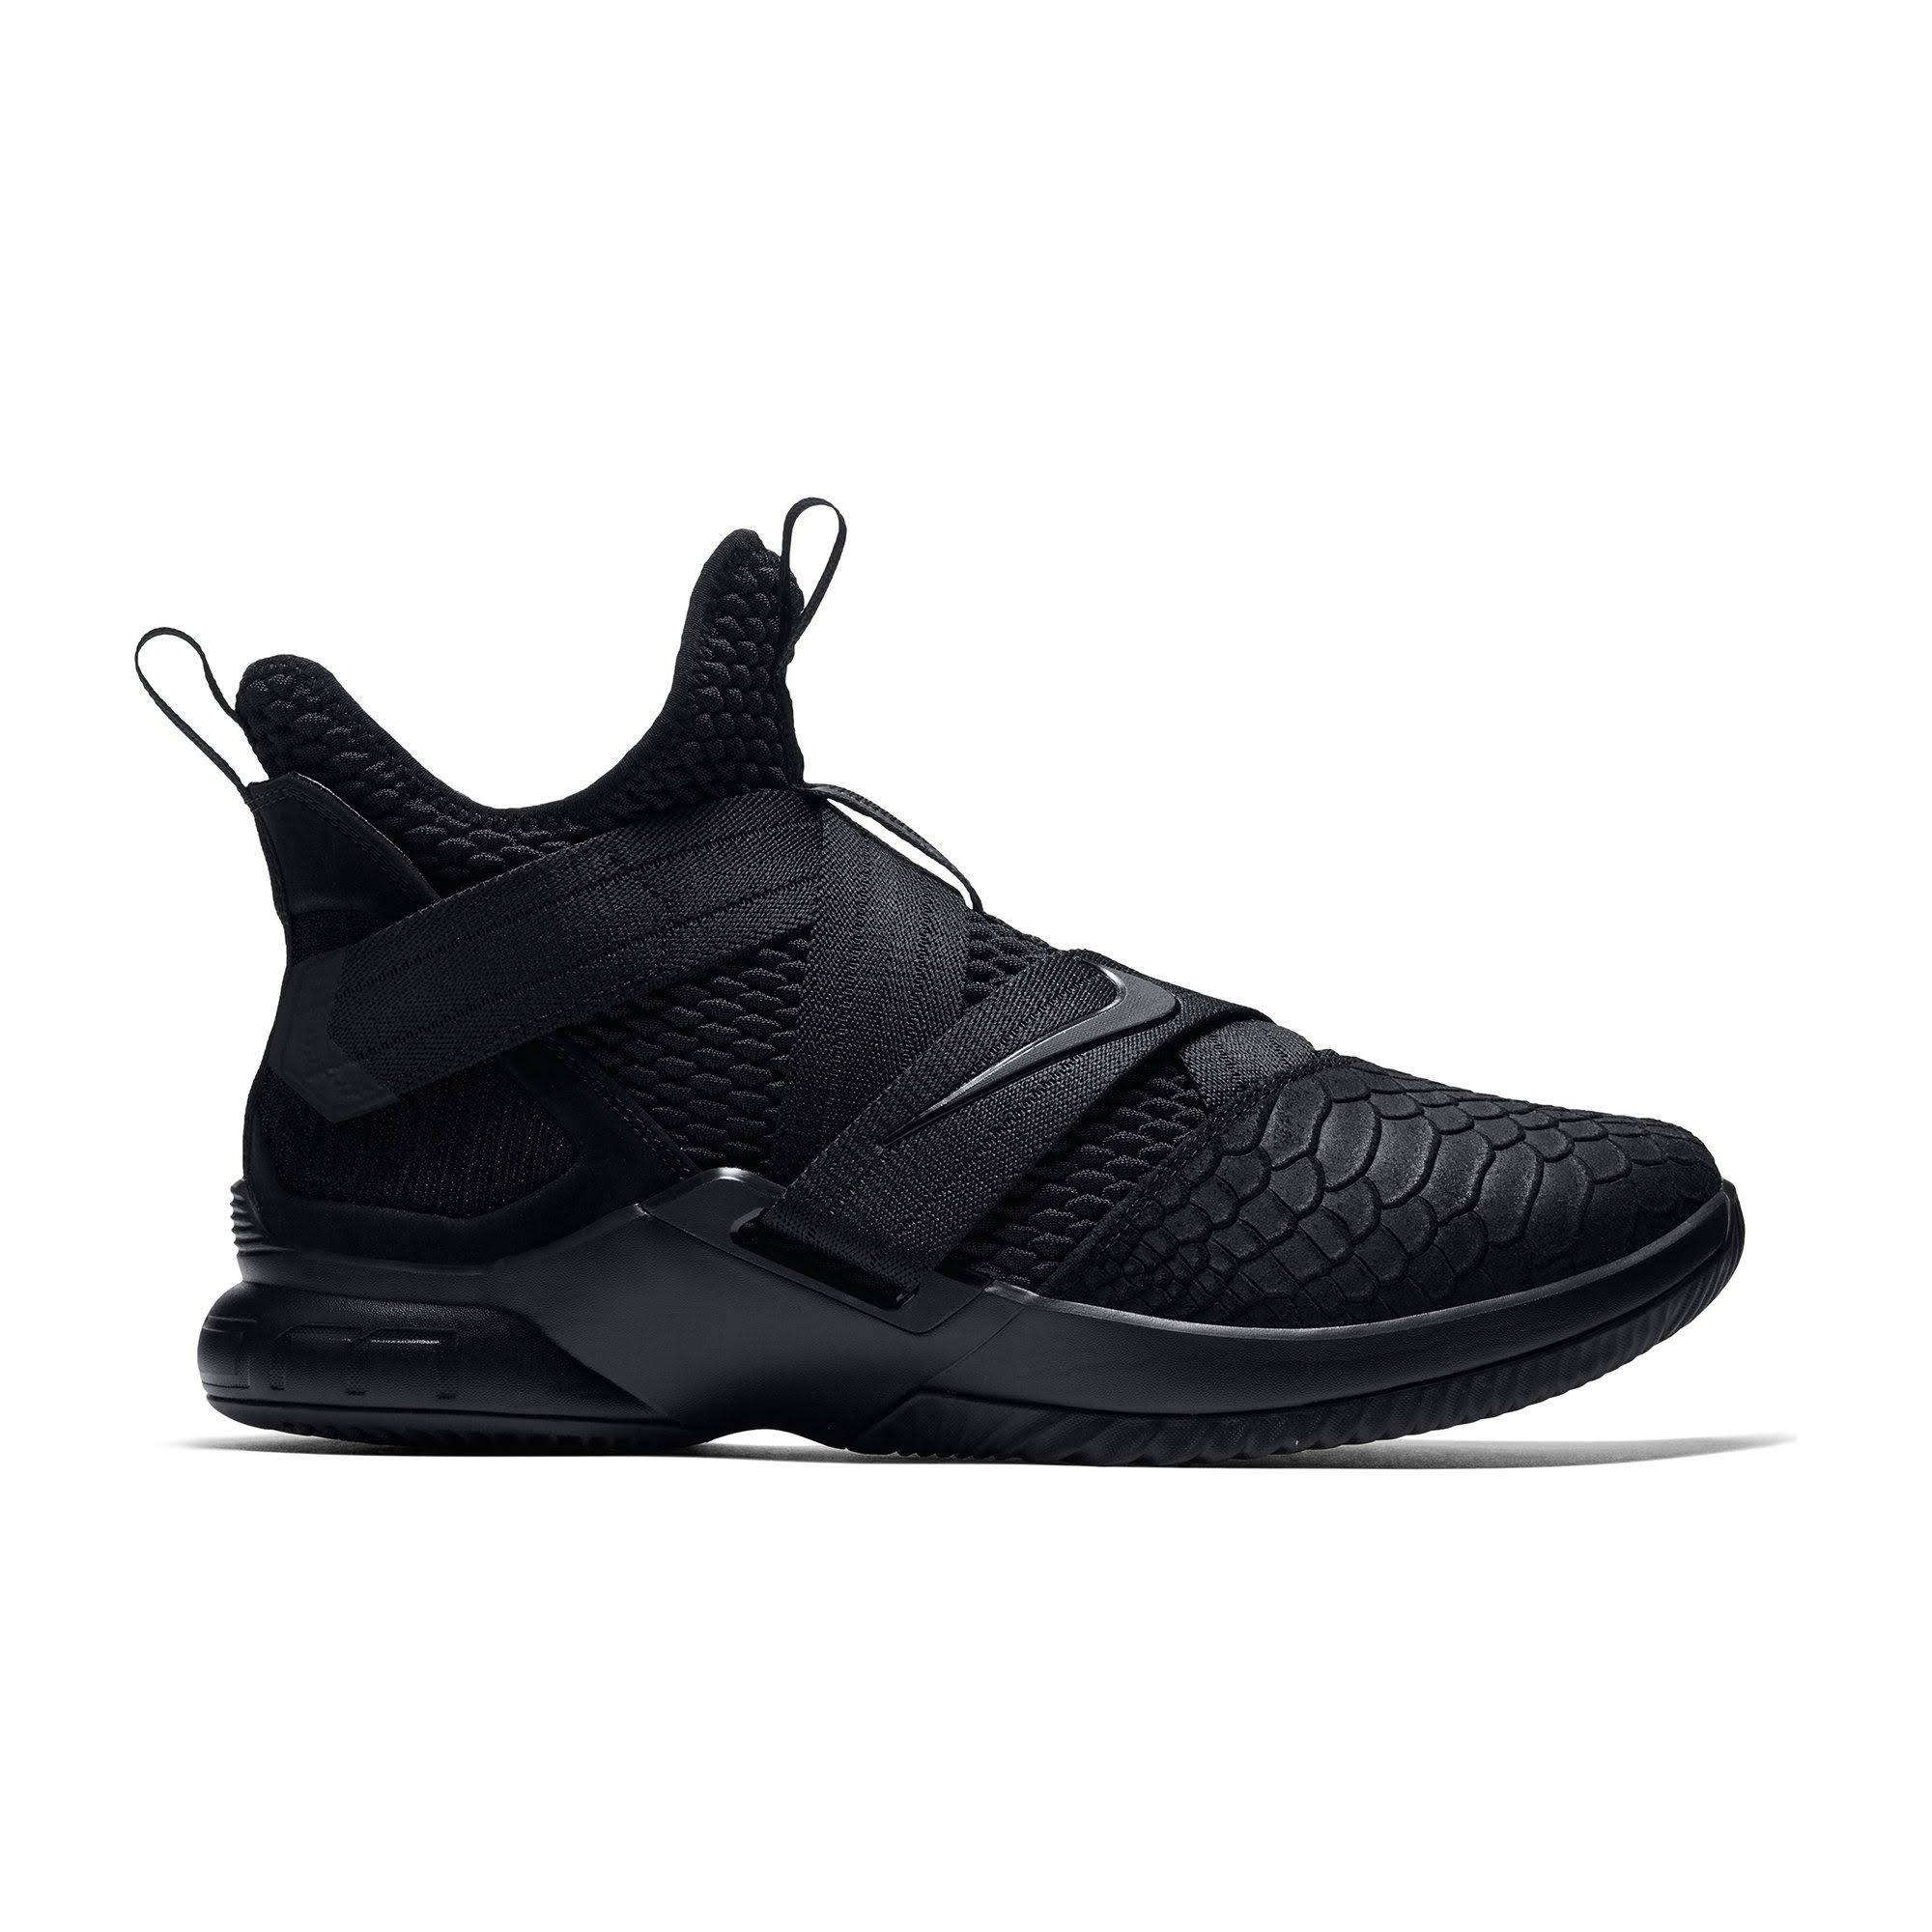 Lebron Lebron Nike Nike Xii Lebron Xii Nike Soldier Soldier Sfg Sfg qUzLMSVGp